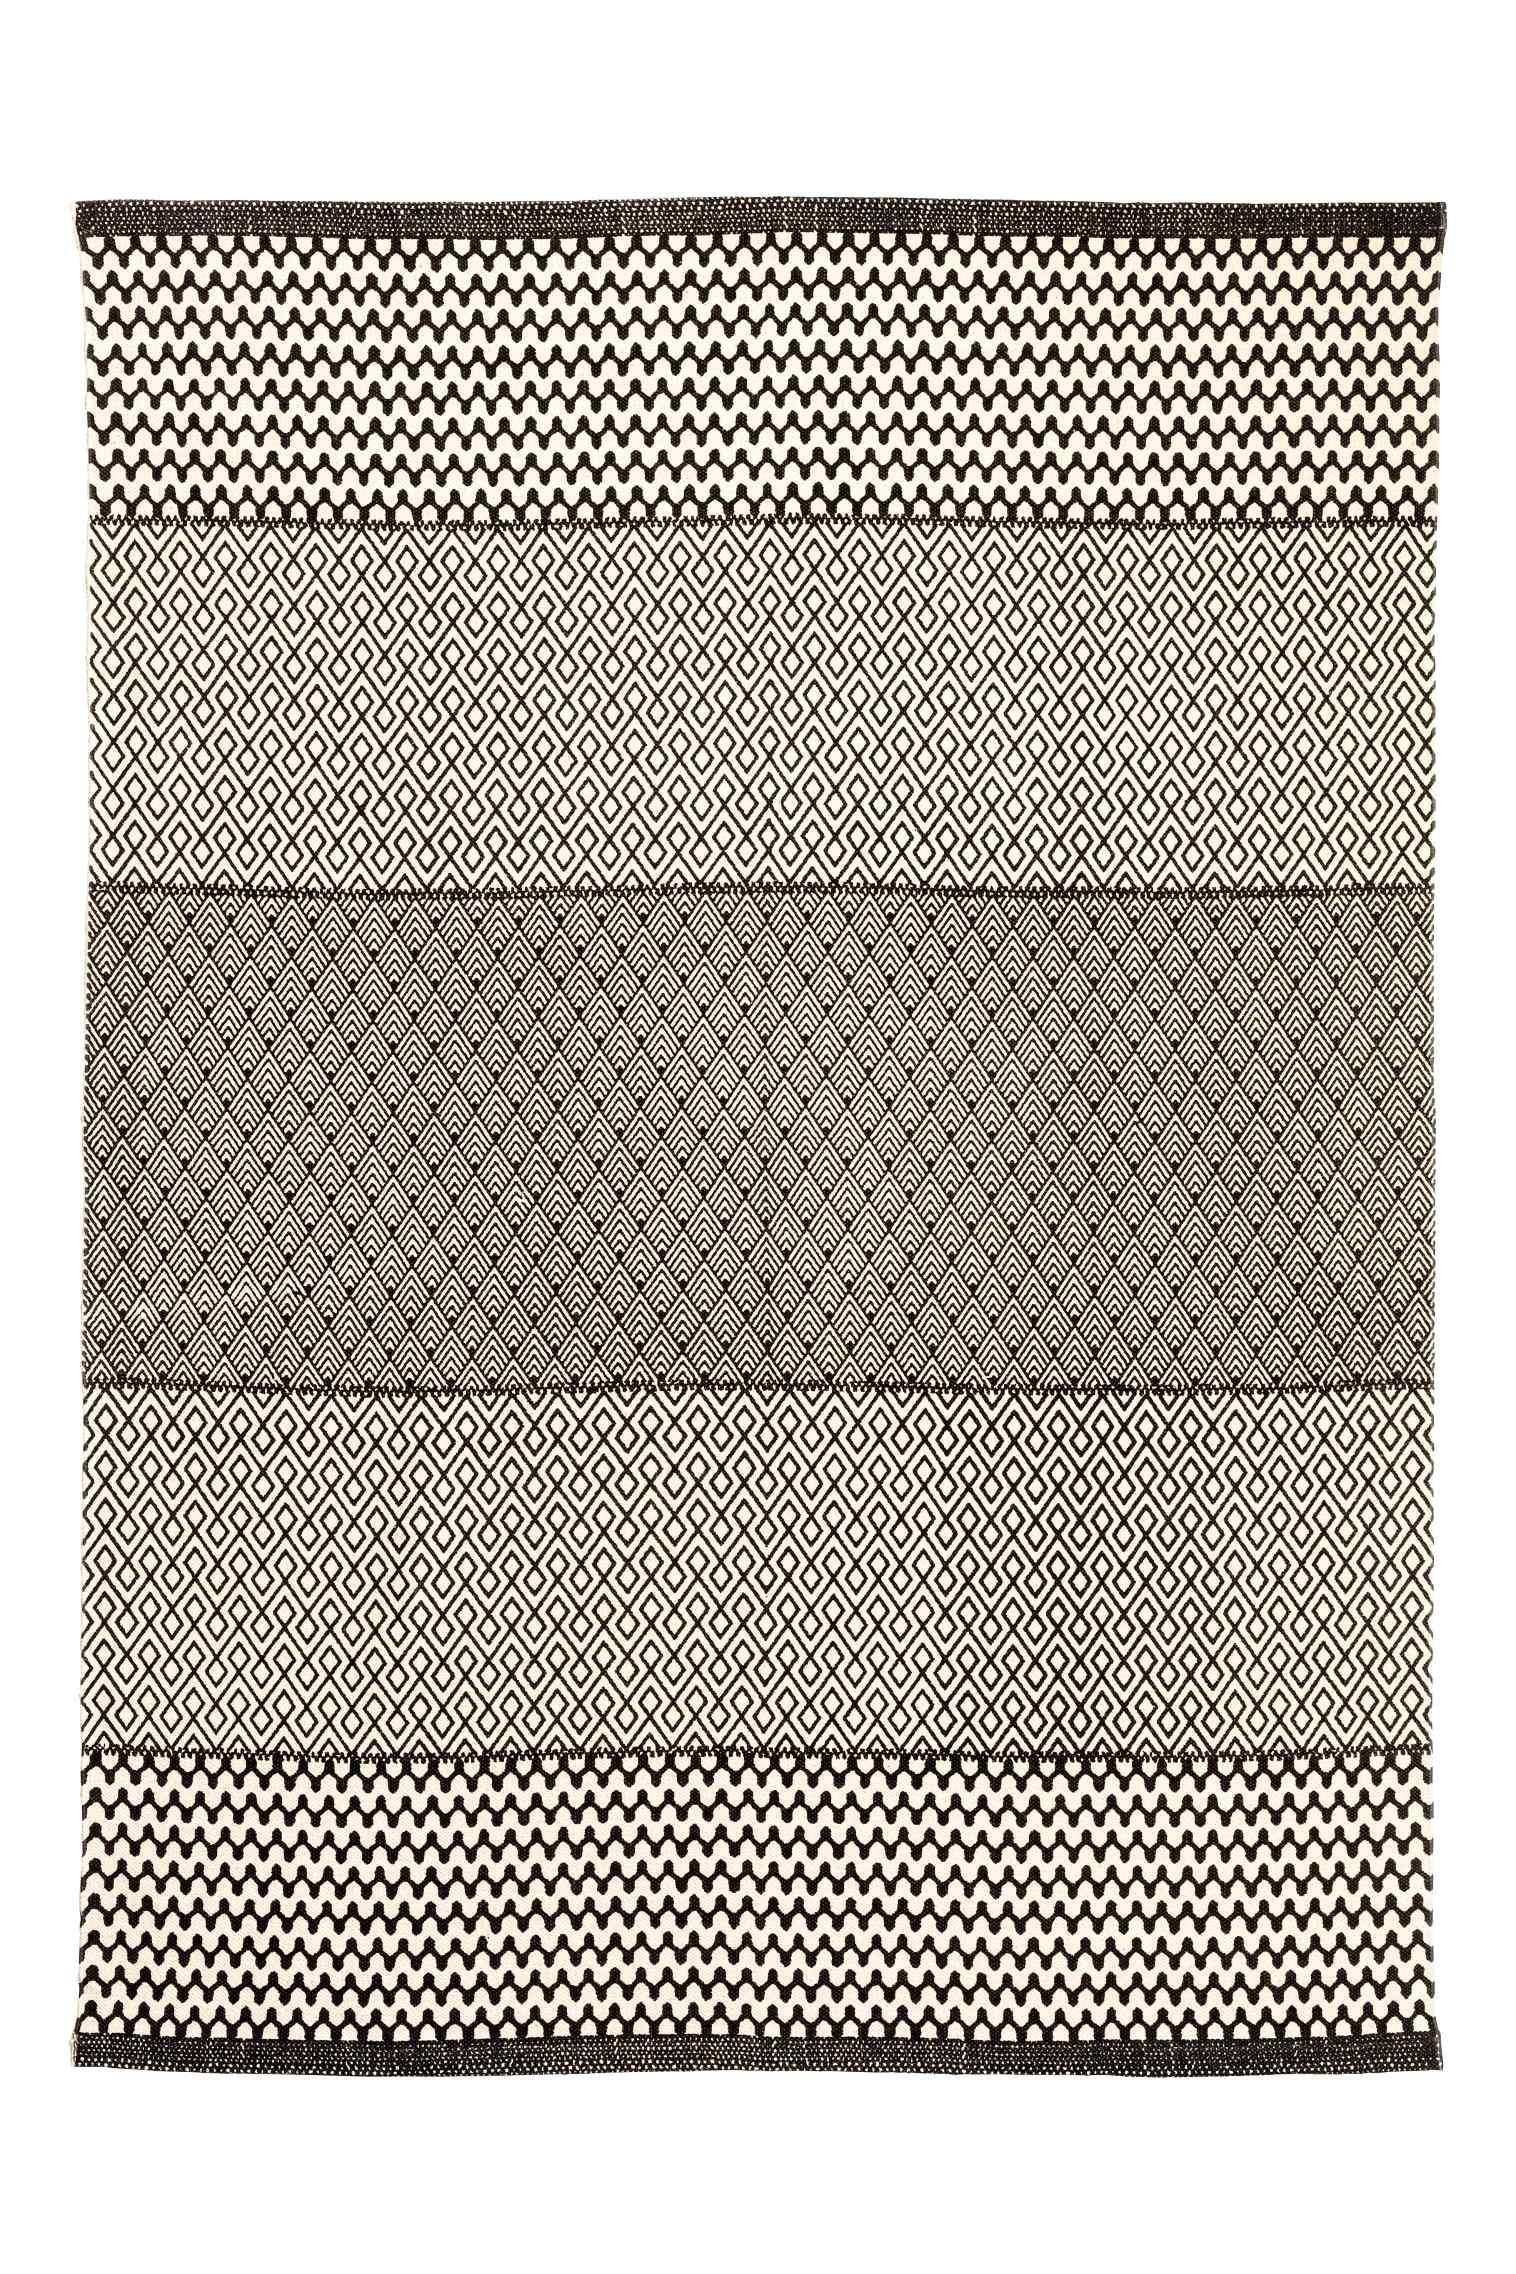 Cotton patterned rug, $99